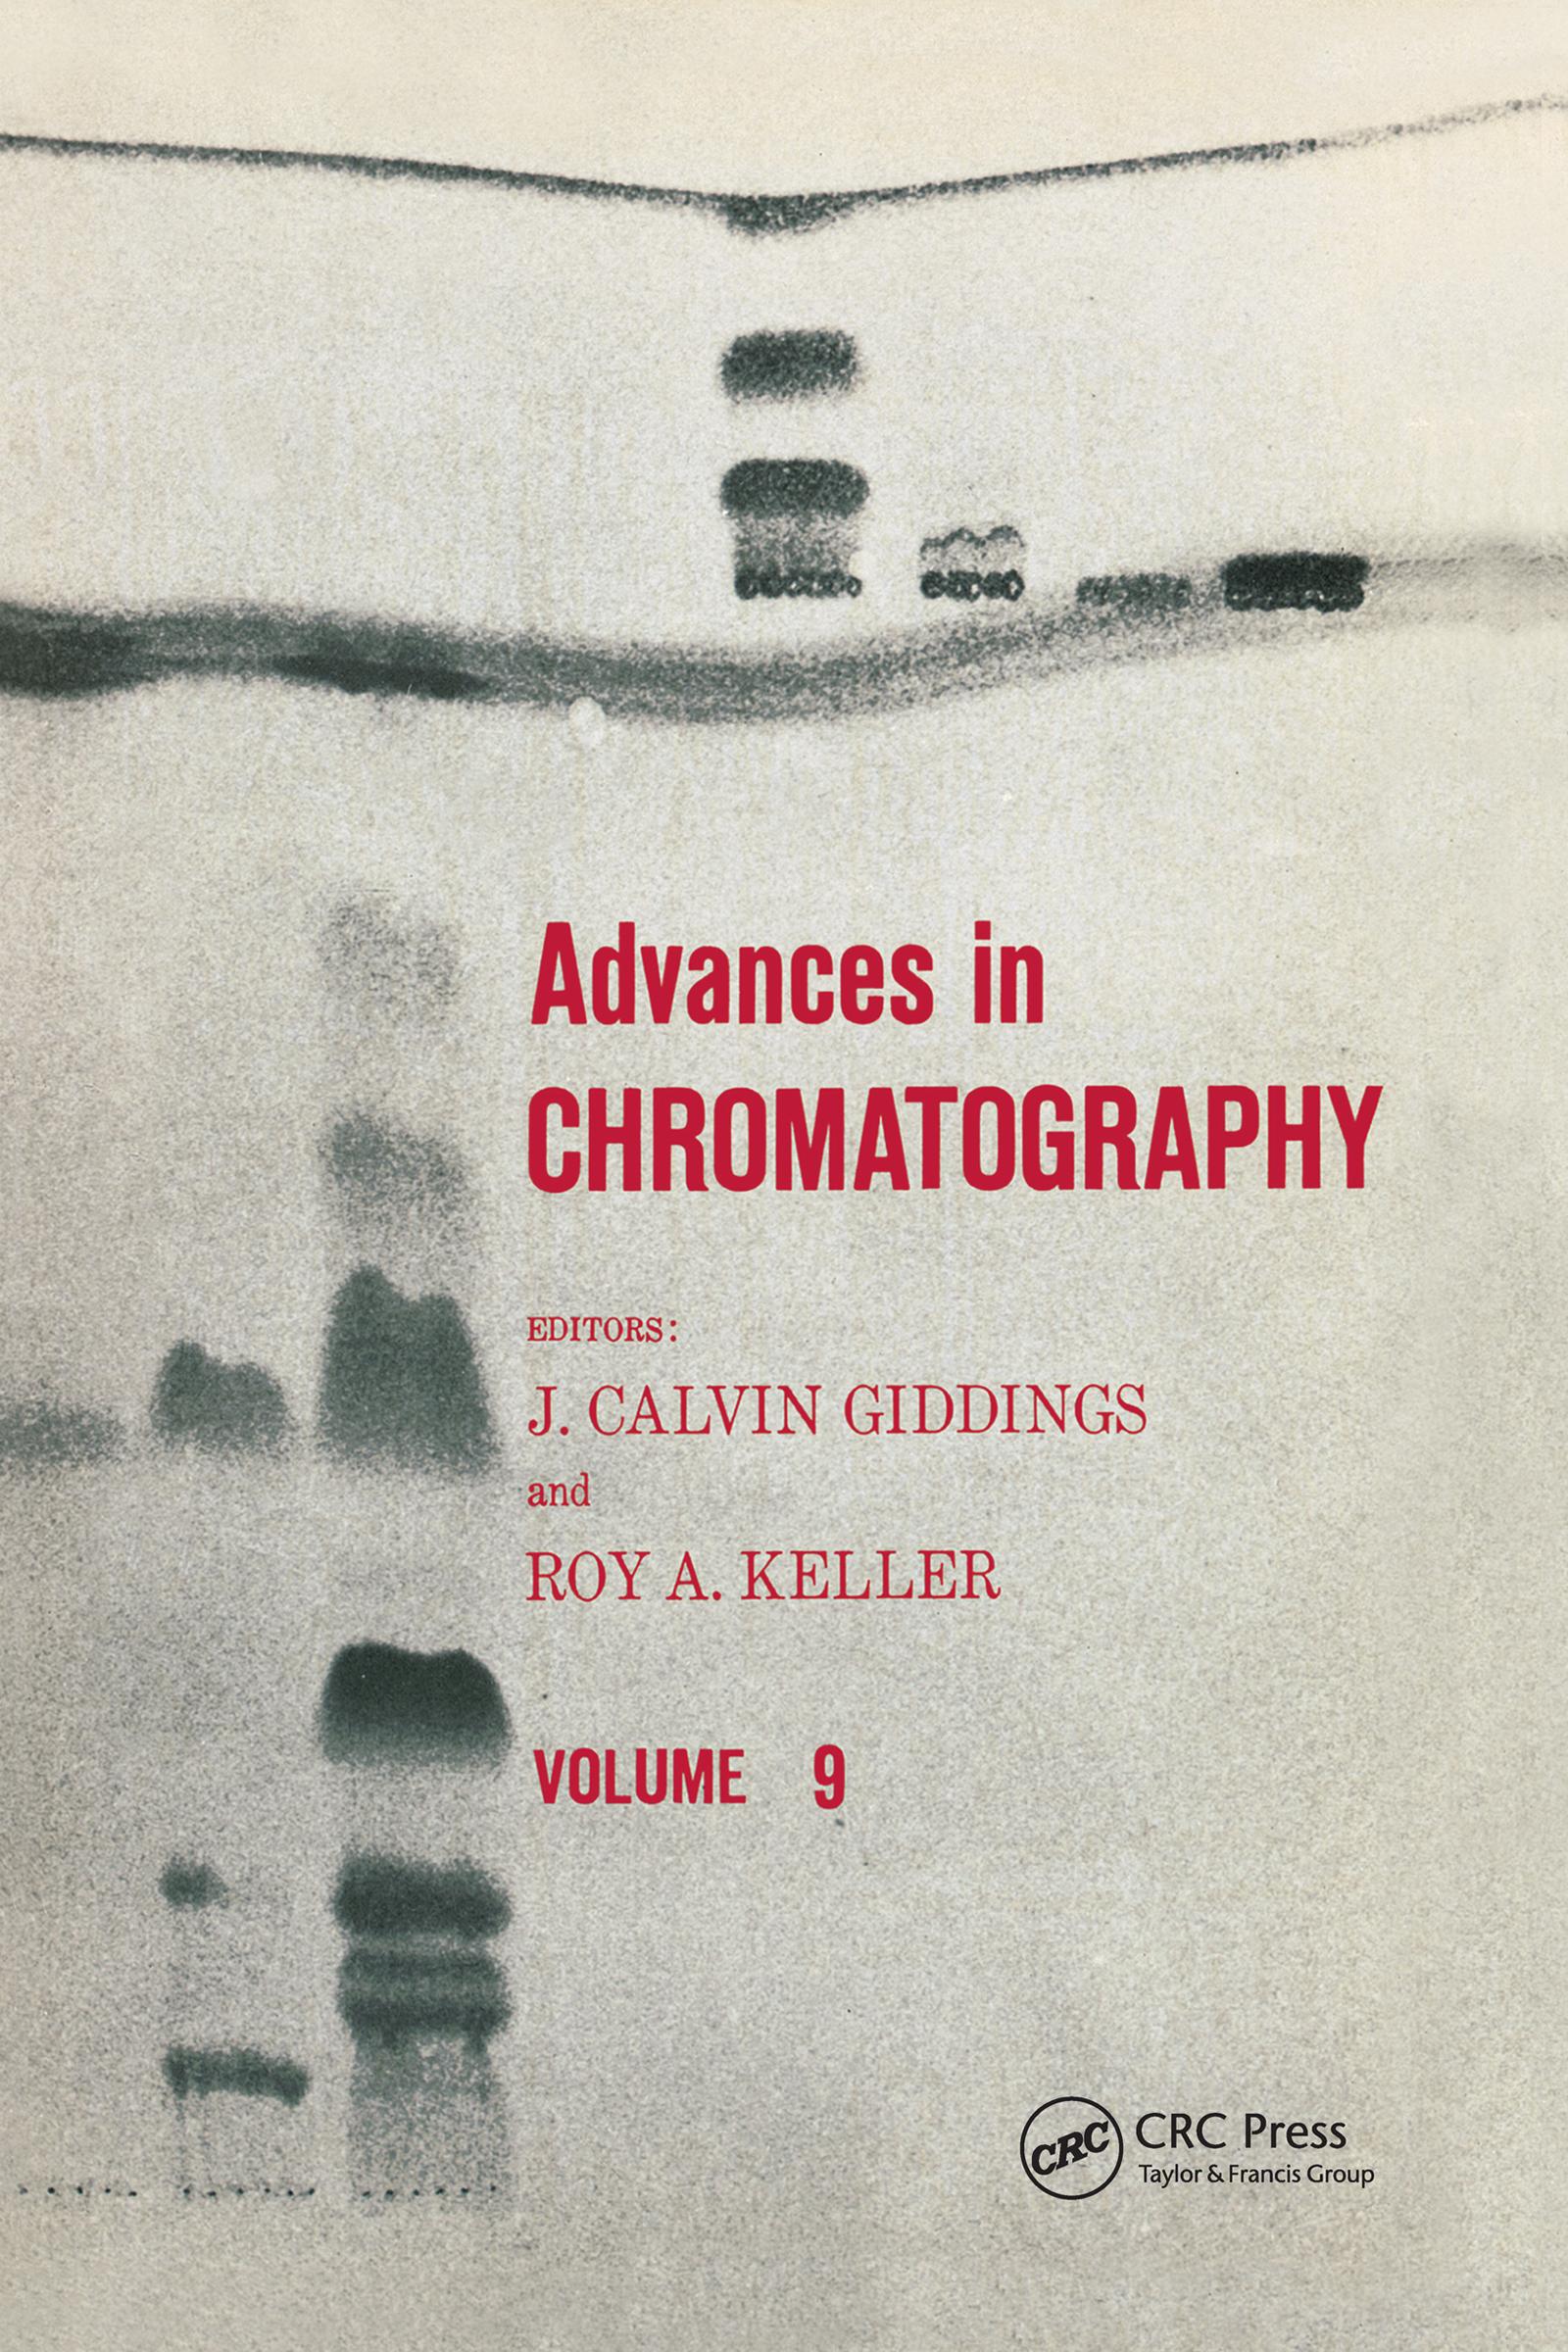 Advances in Chromatography: Volume 9 book cover